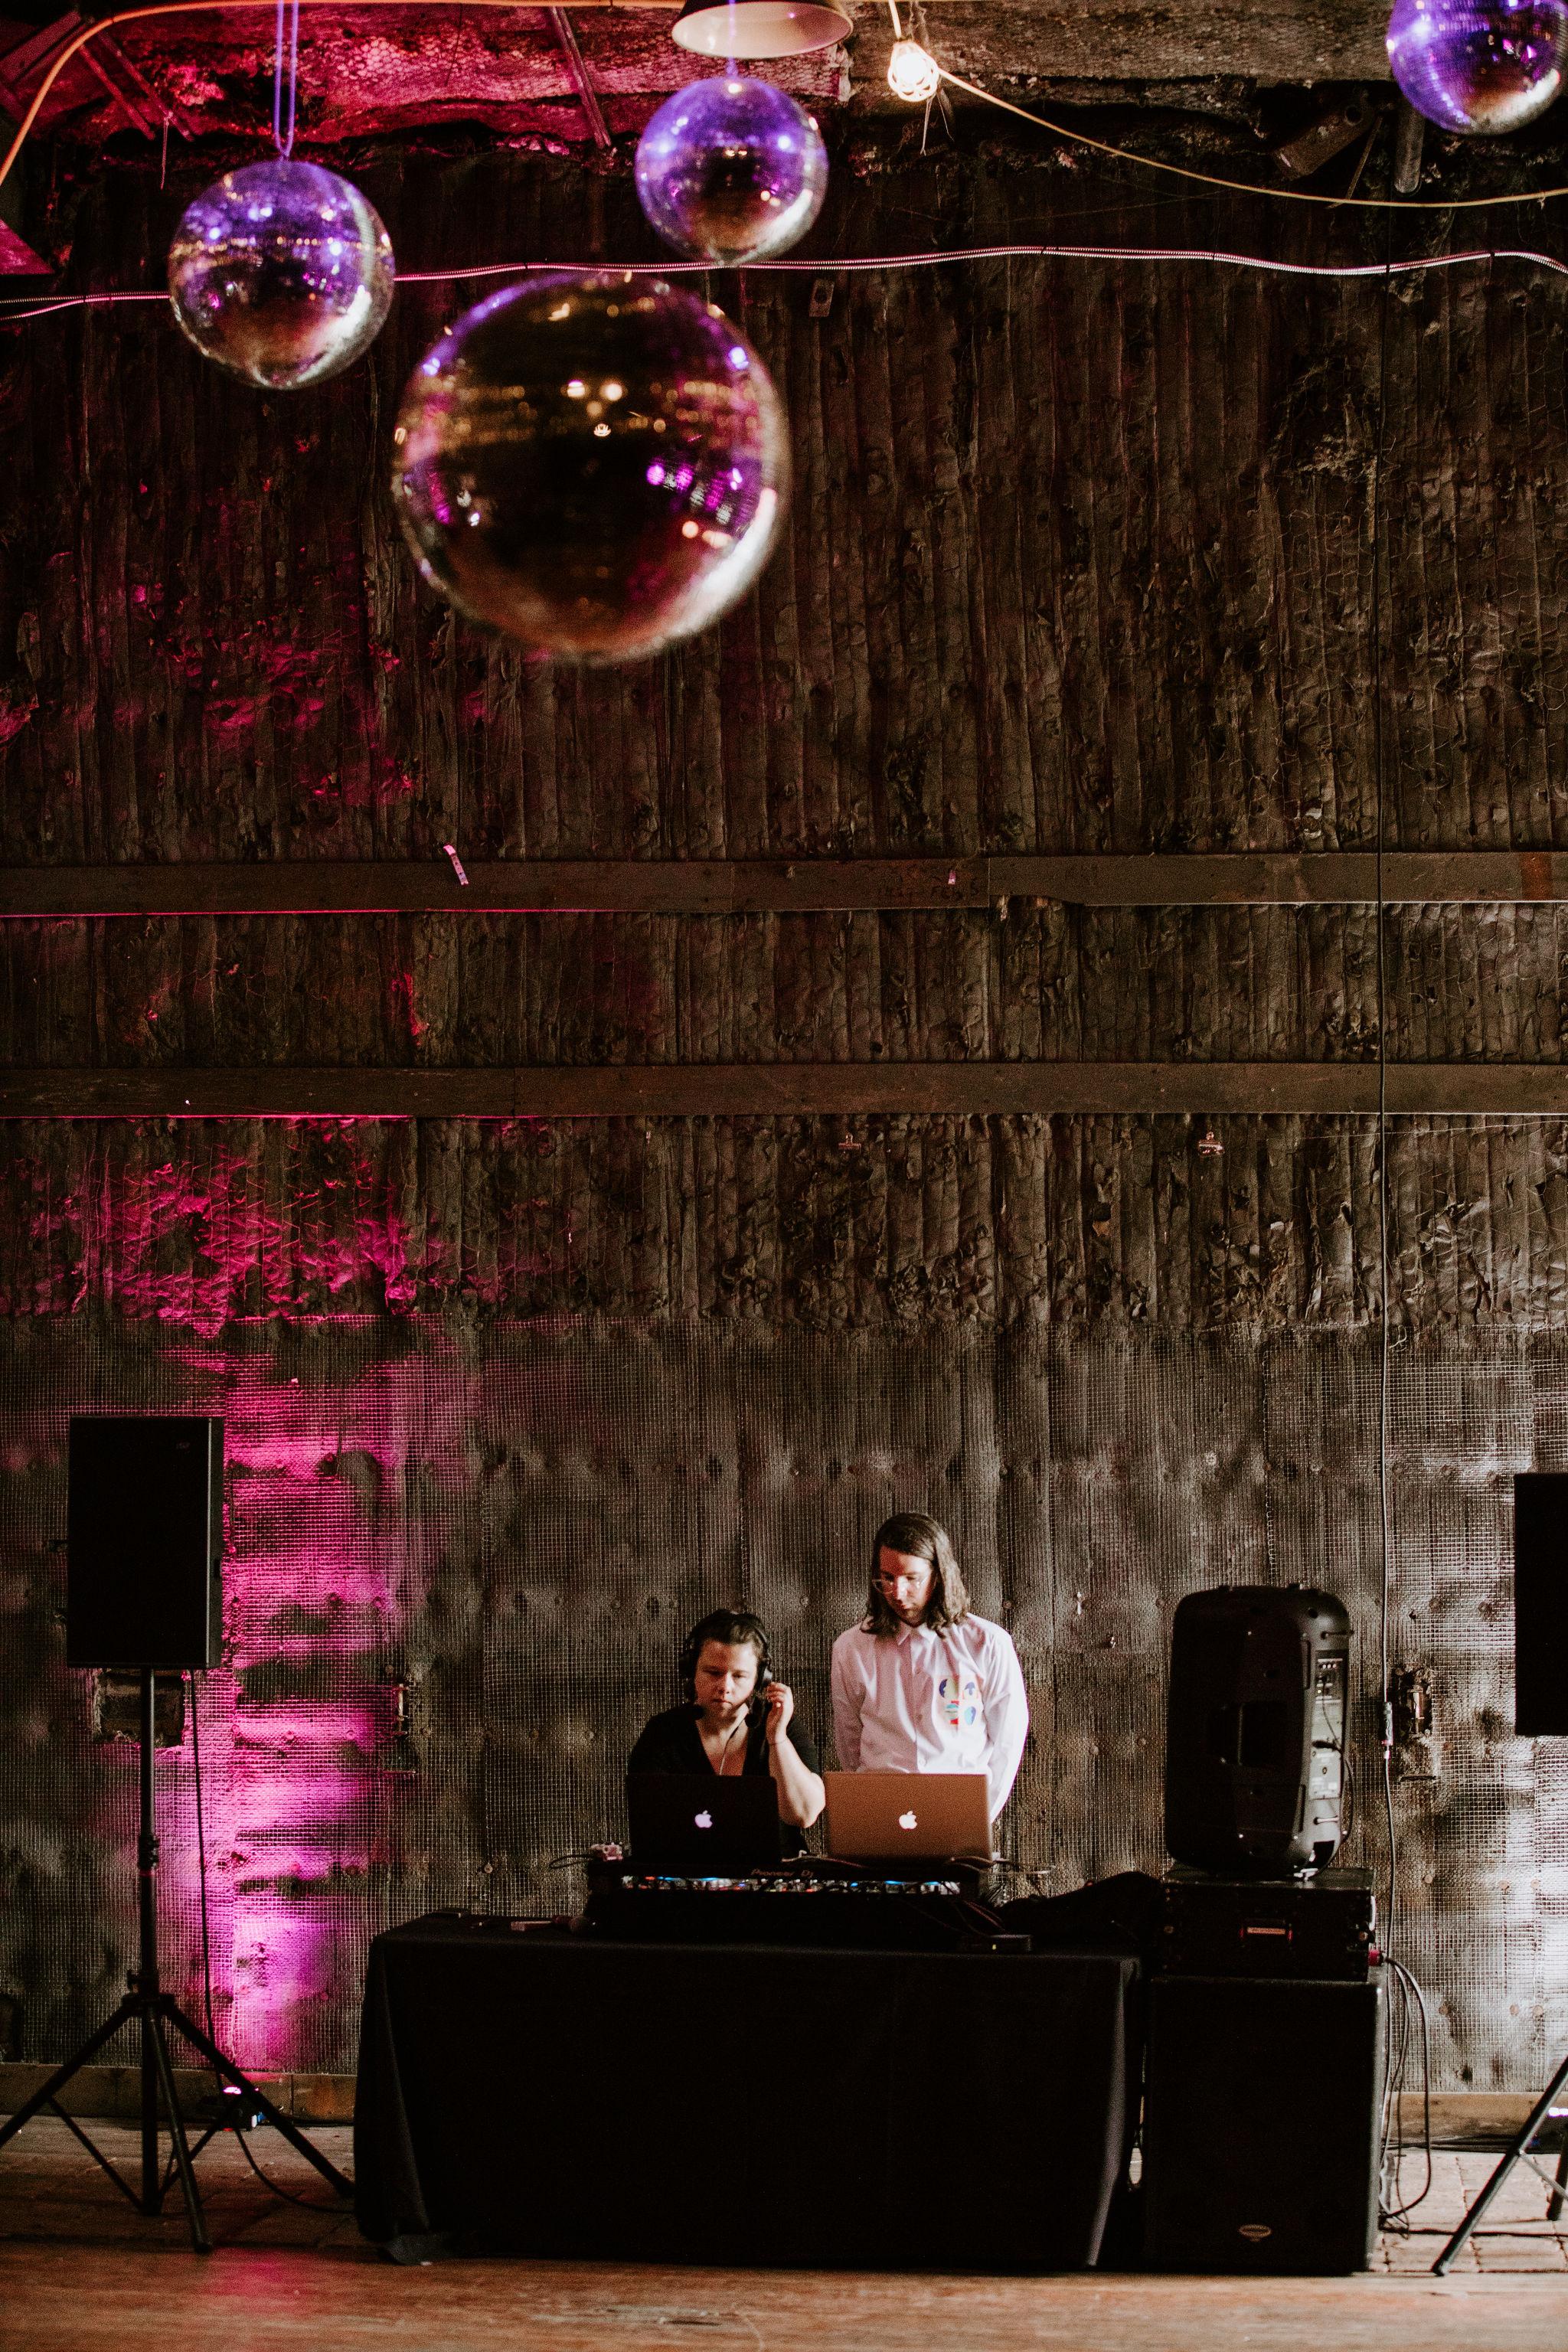 DetroitIndustrialWedding_Geoff&LyndsiPhotography_Alex&Jen_Reception21.jpg